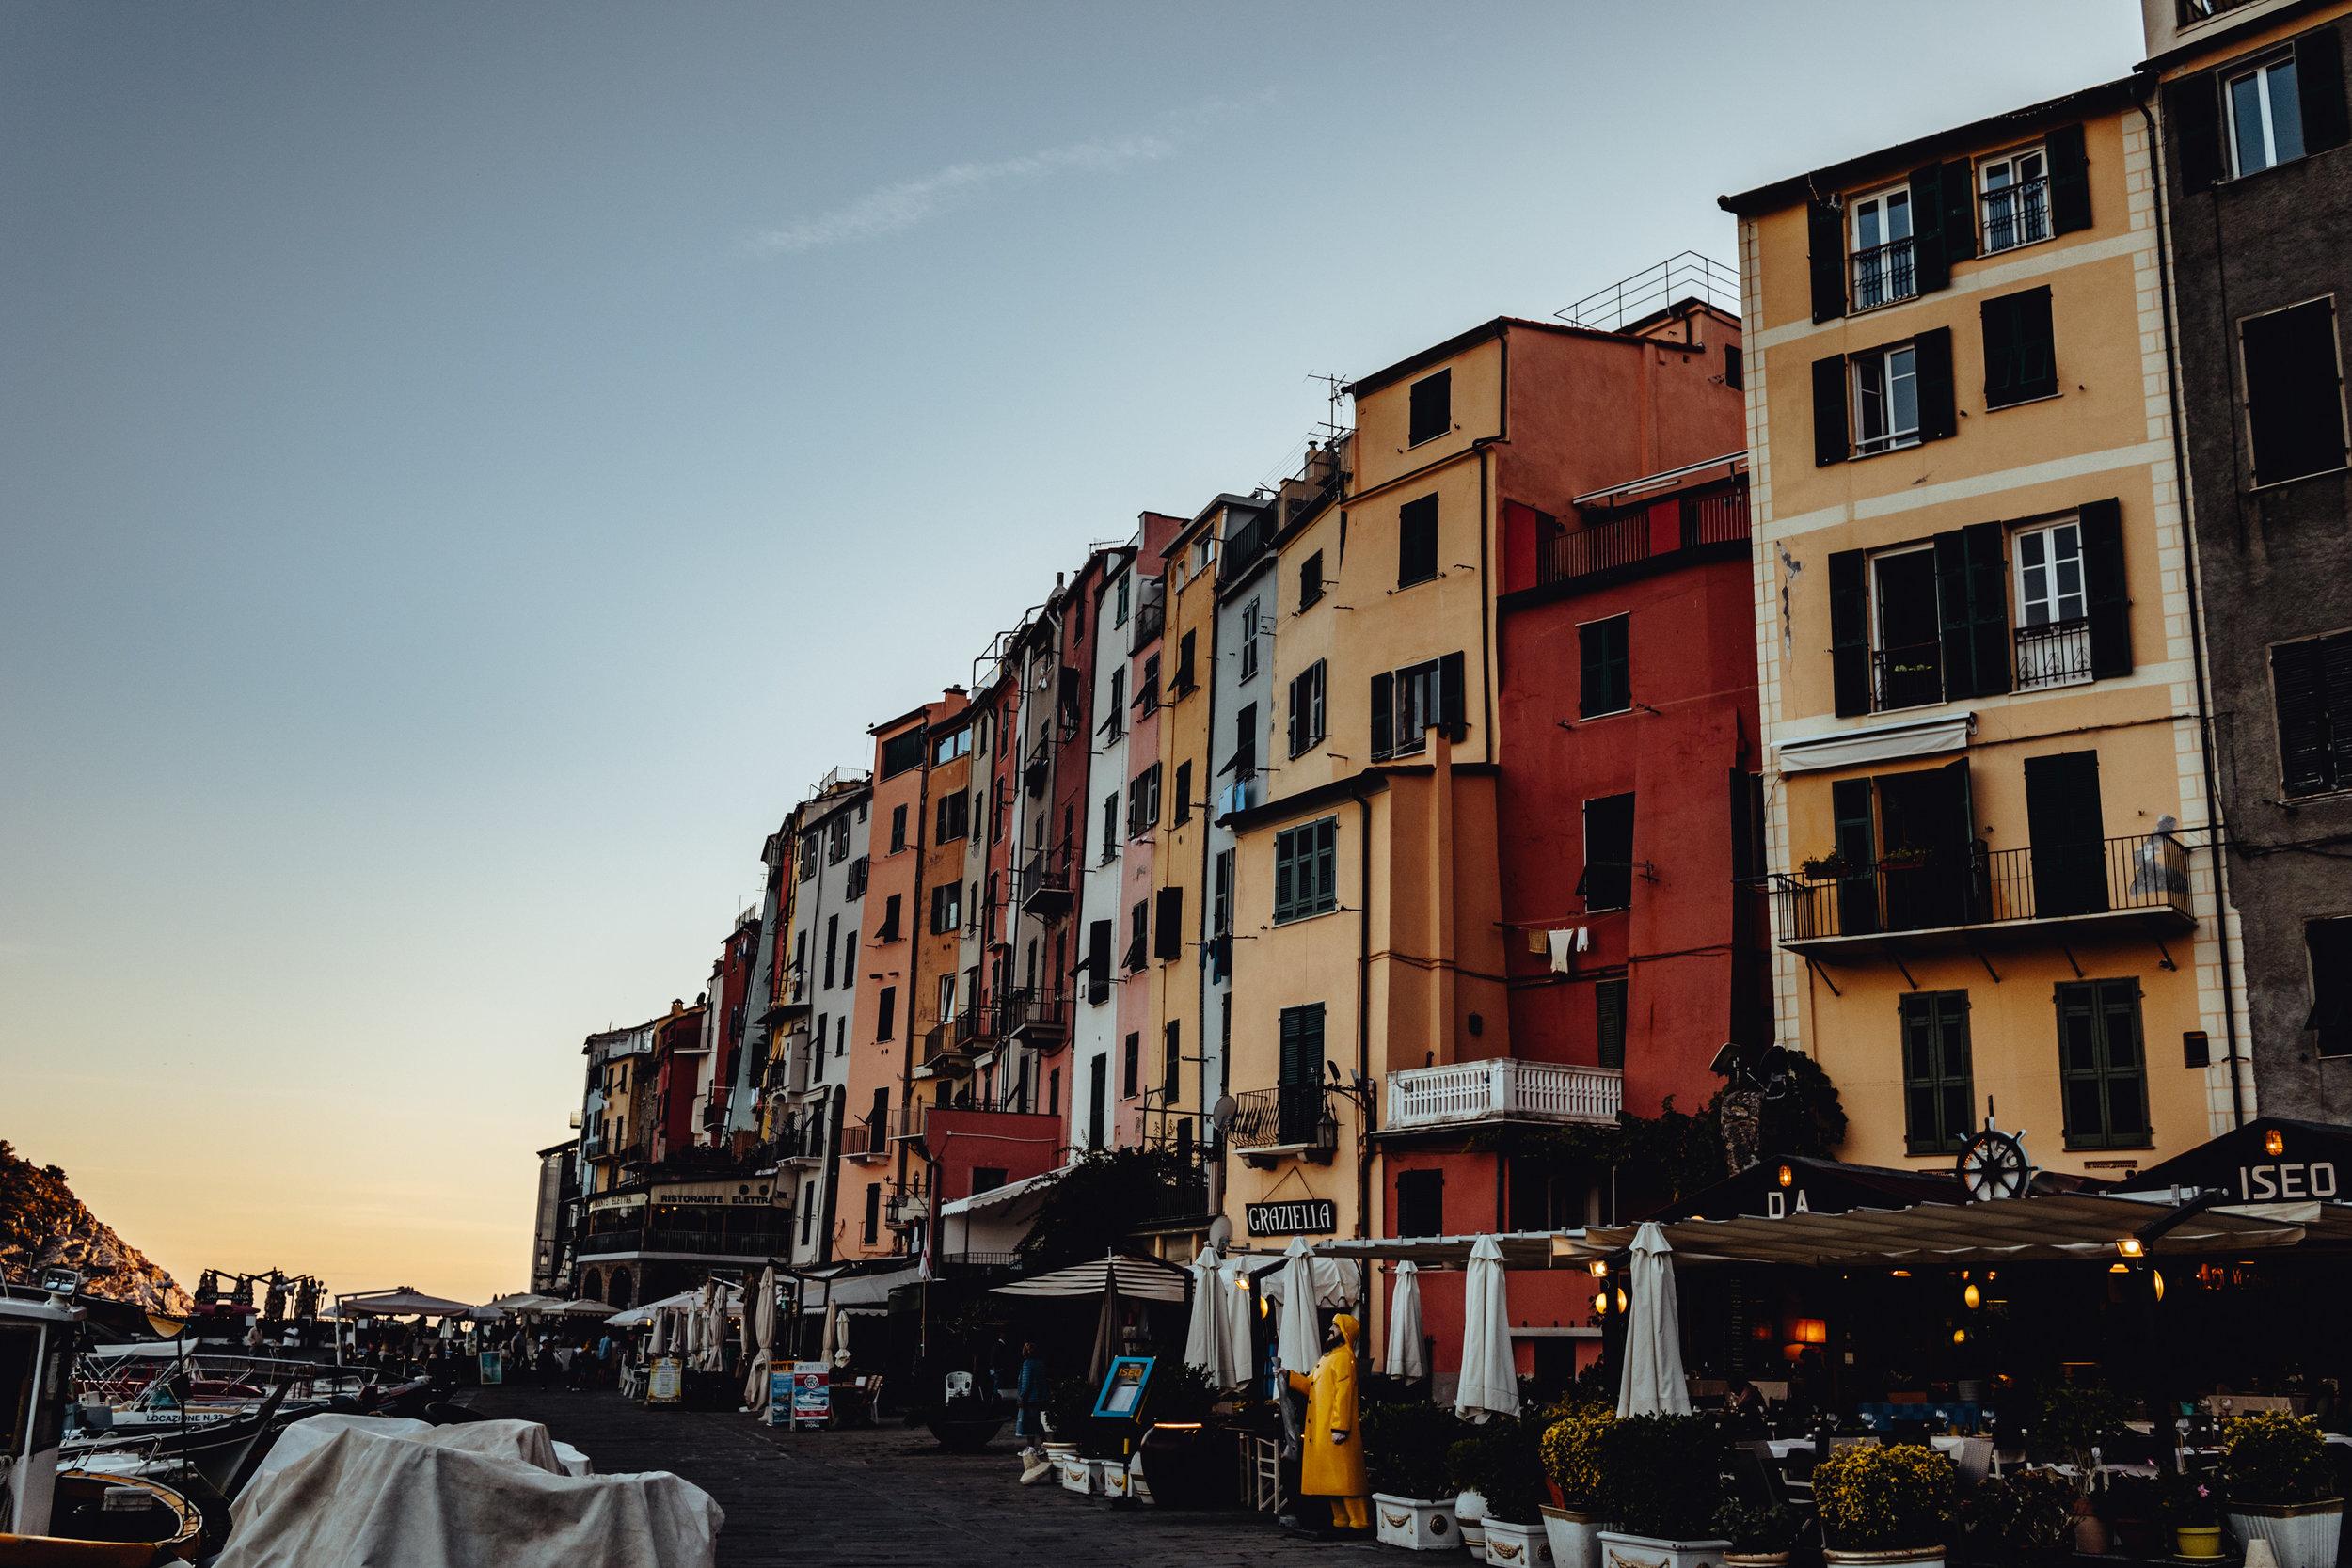 Italy-277.jpg